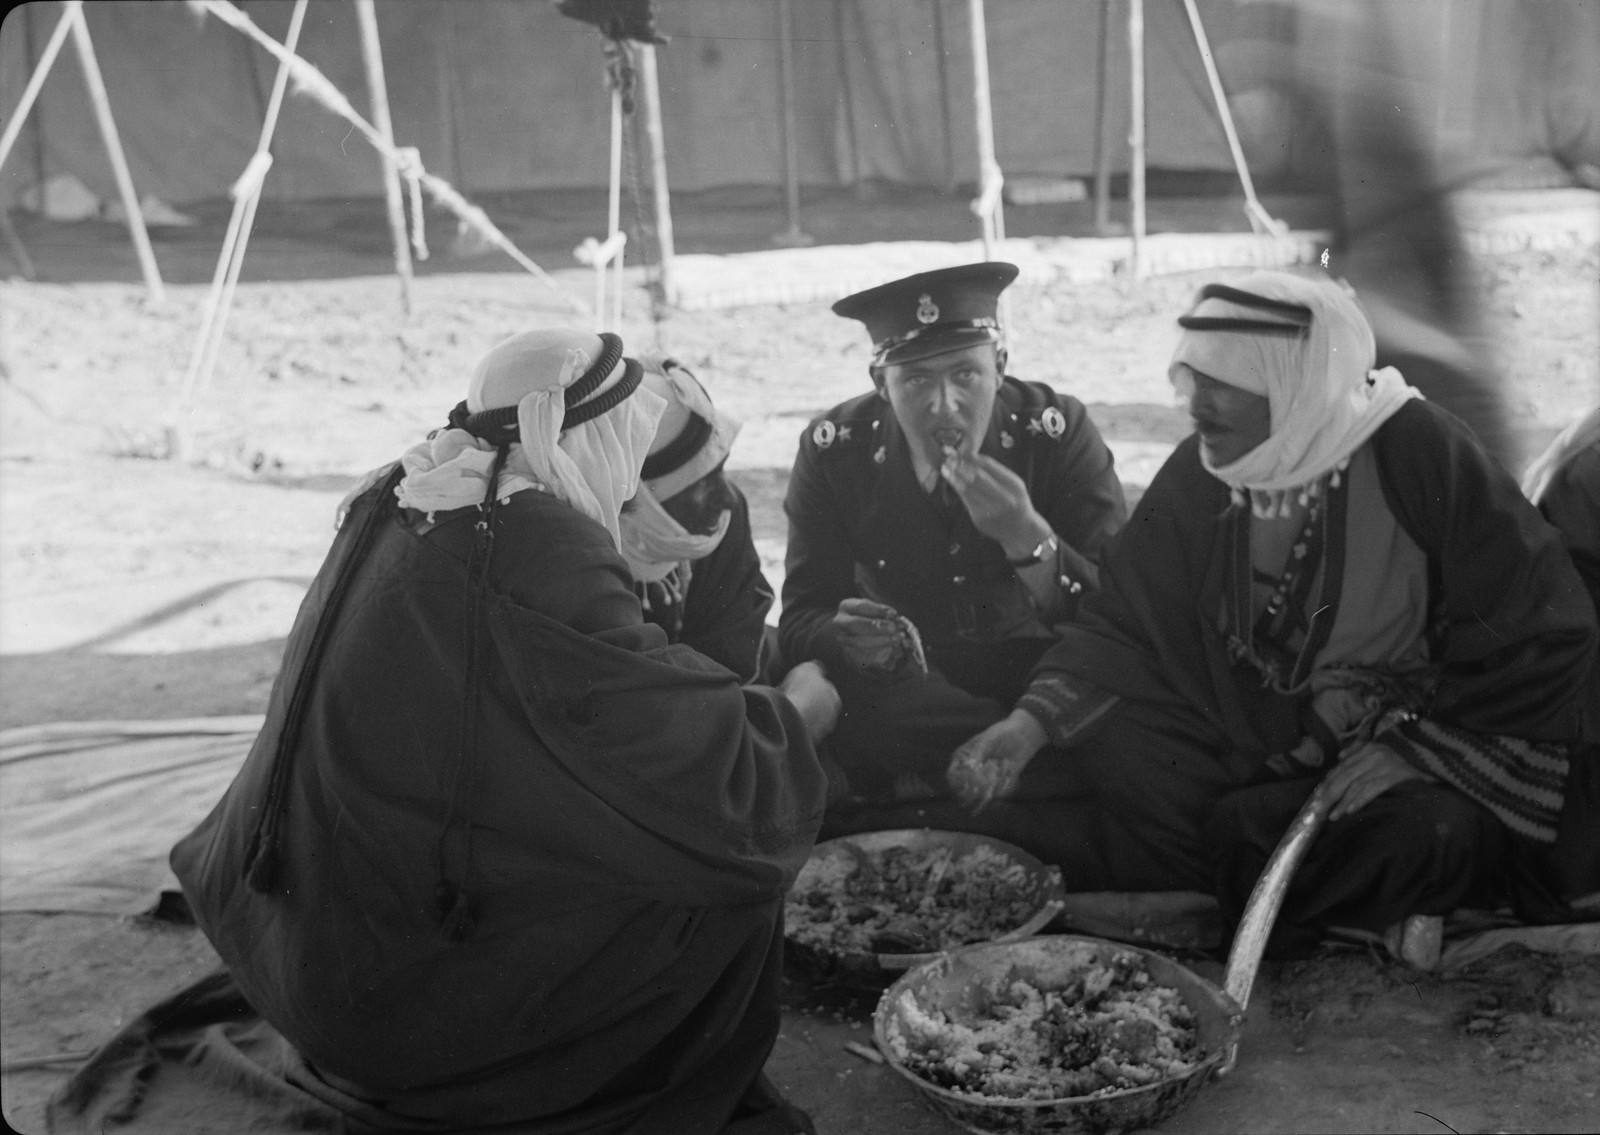 15. Группа шейхов и инспектор Стивенс обедают вместе